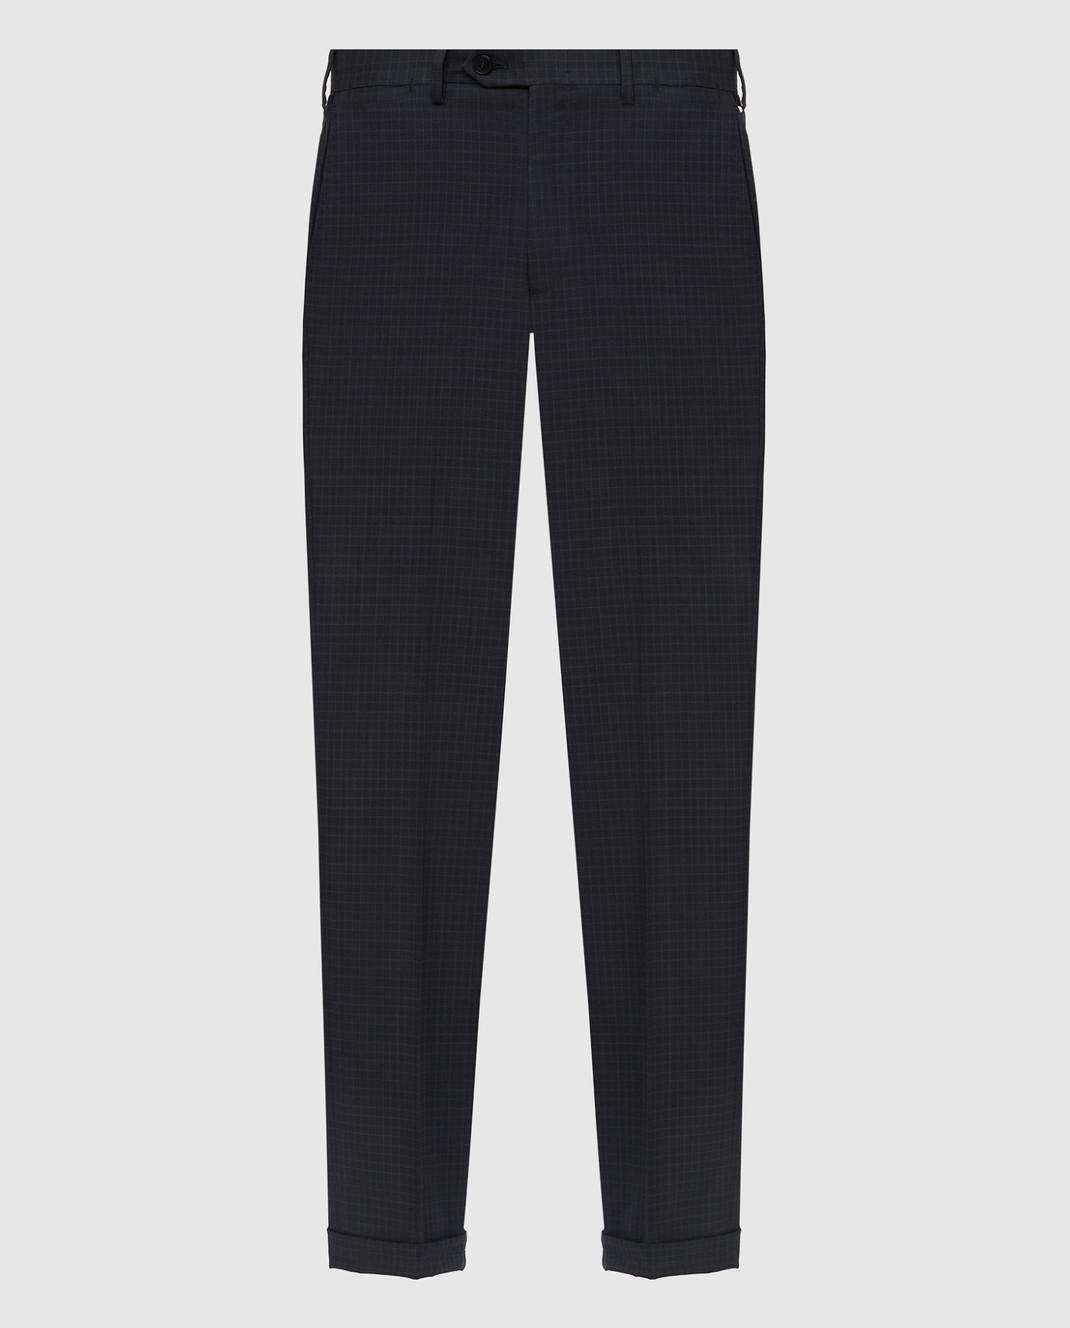 Brioni Темно-серые брюки из шерсти RPL80LP5A71